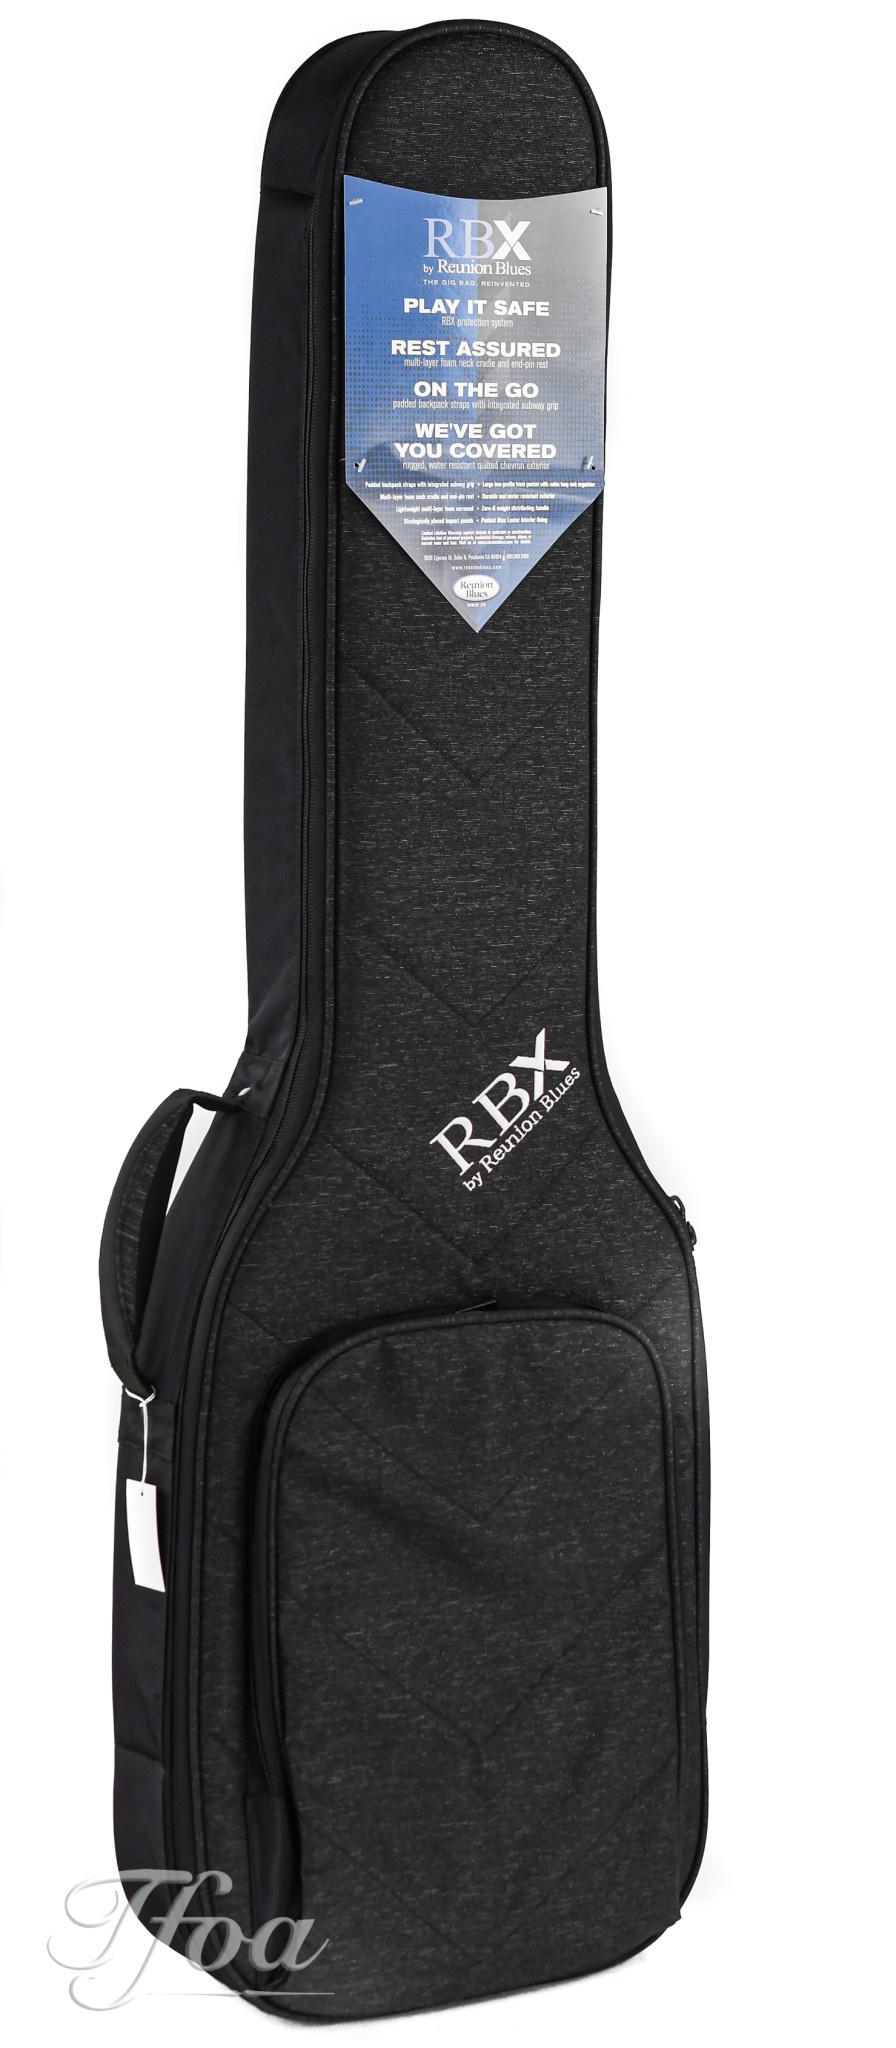 Reunion Blues RBX Oxford Bass Guitar Gig Bag